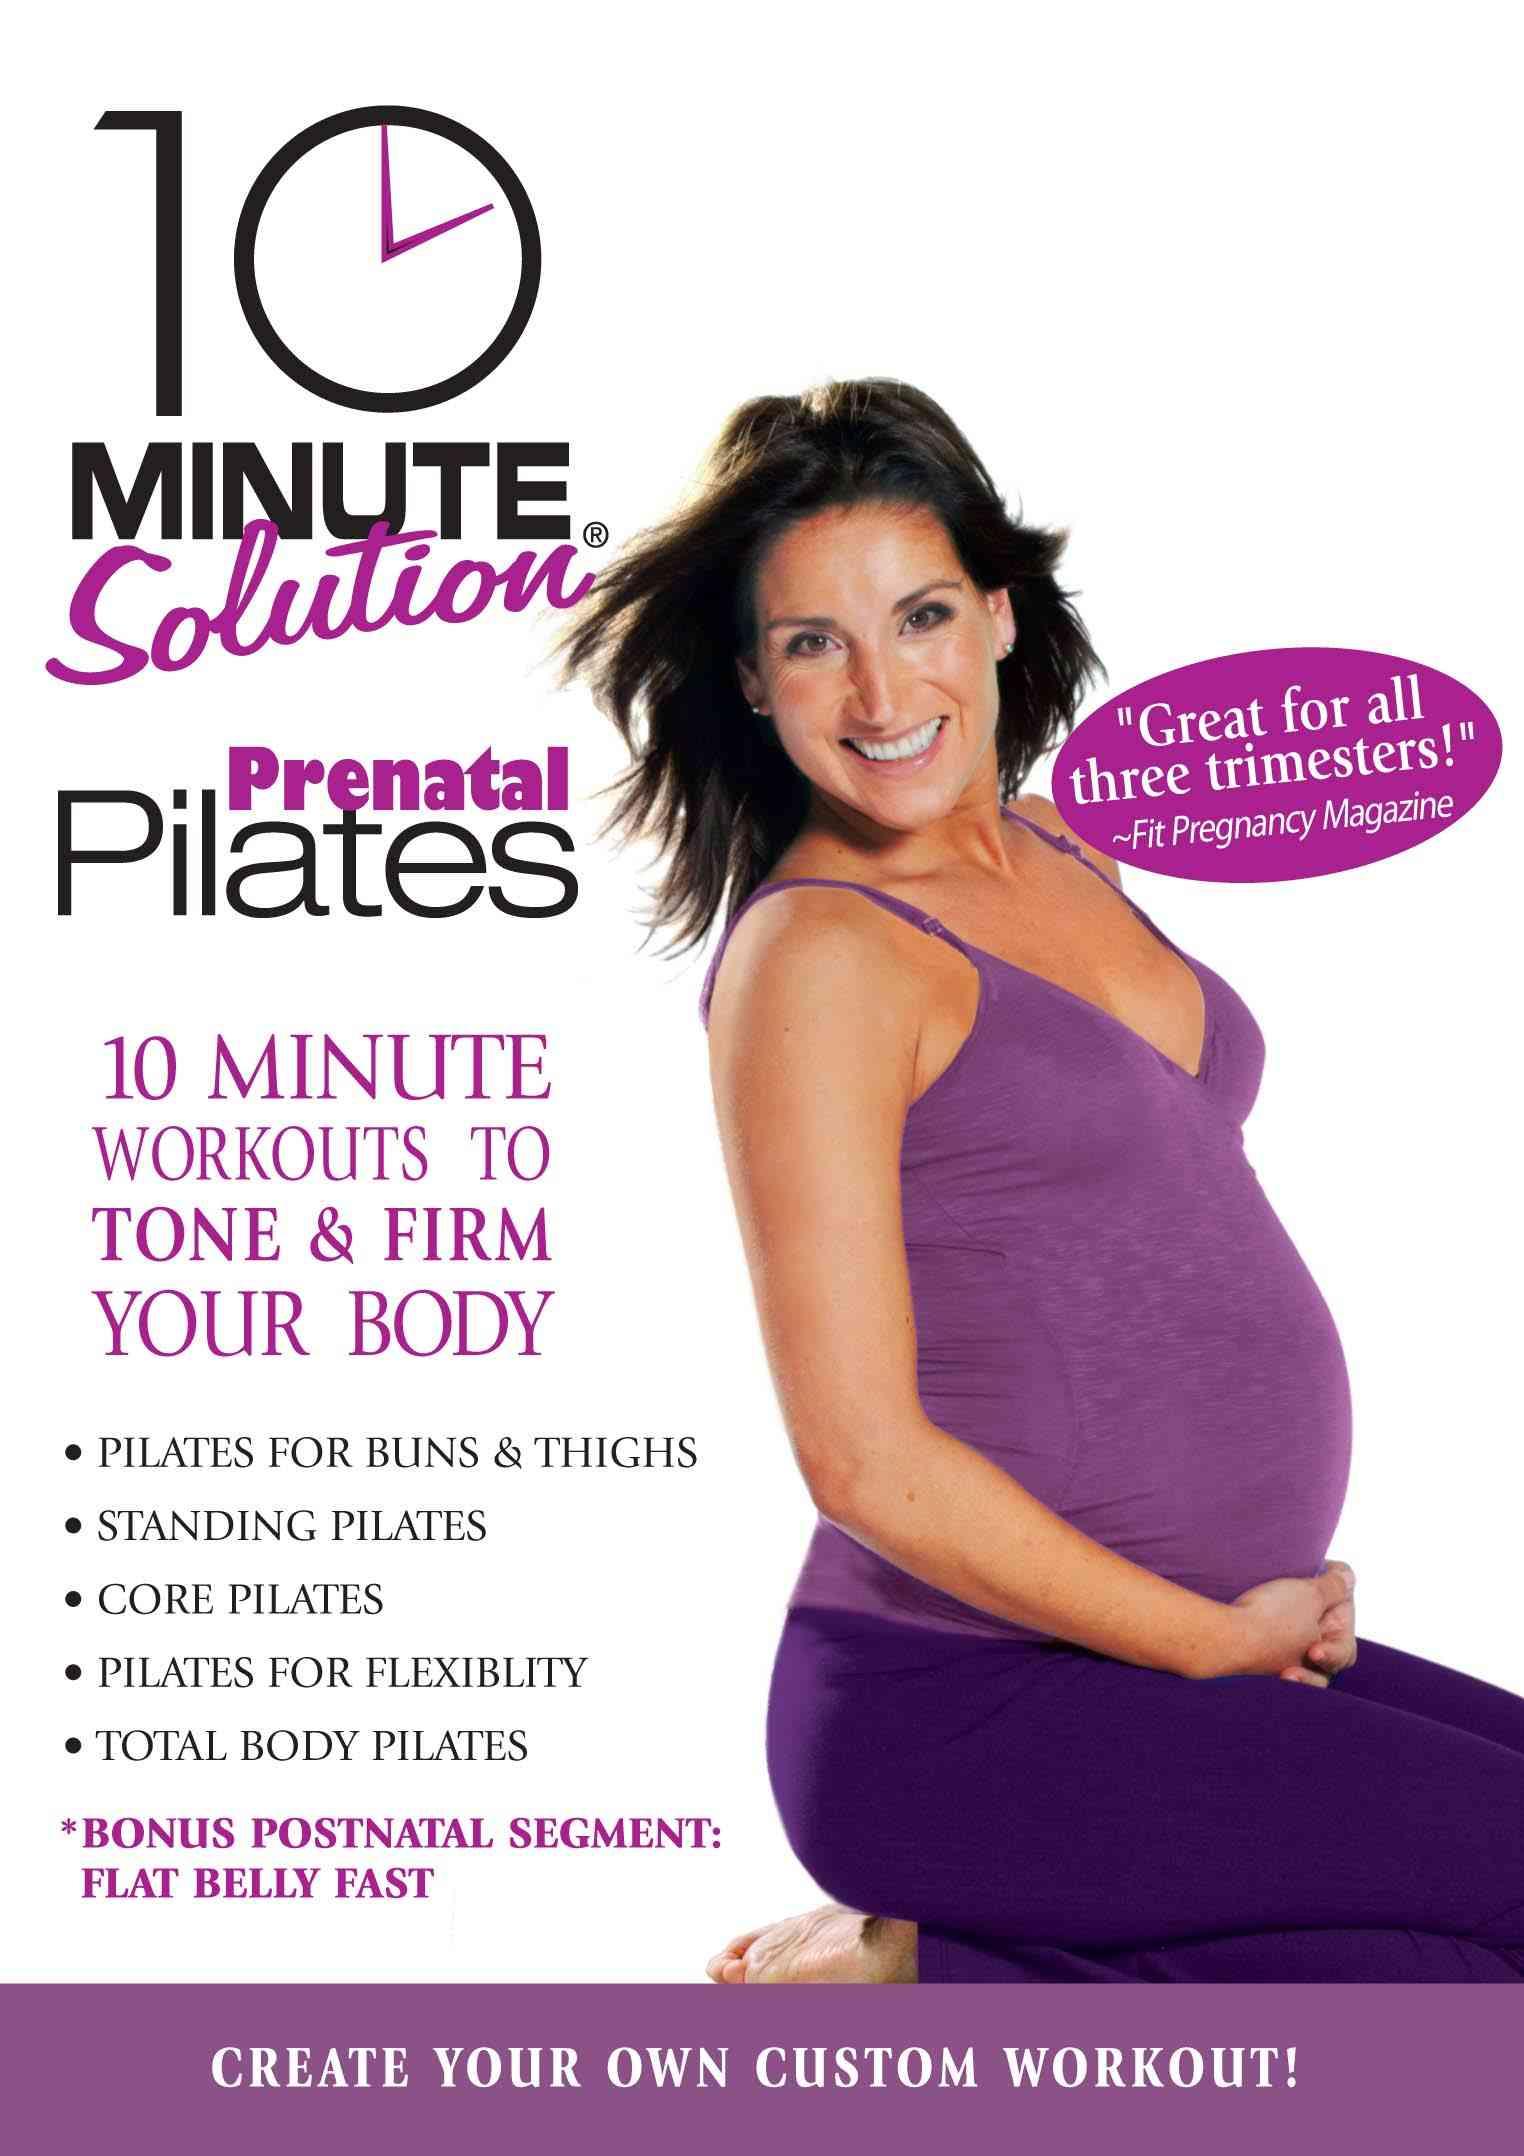 Exercise/fitness: Pregnancy